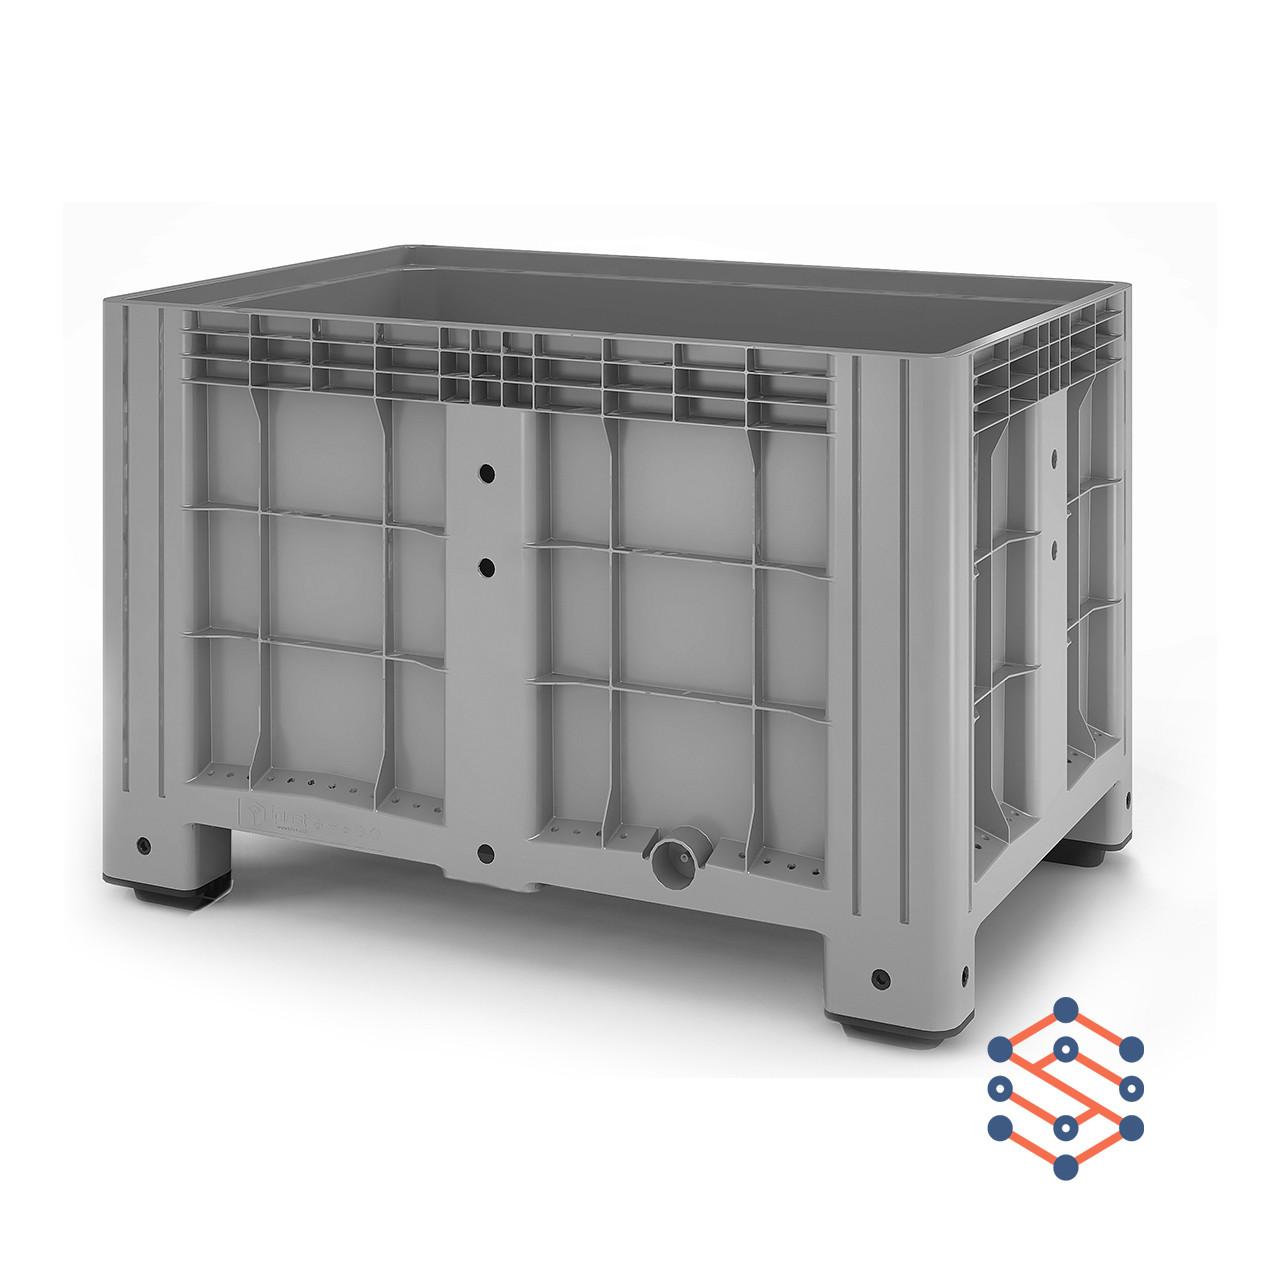 Цельнолитой пластиковый контейнер BigBox на 4-х ножках 1200х800х800мм